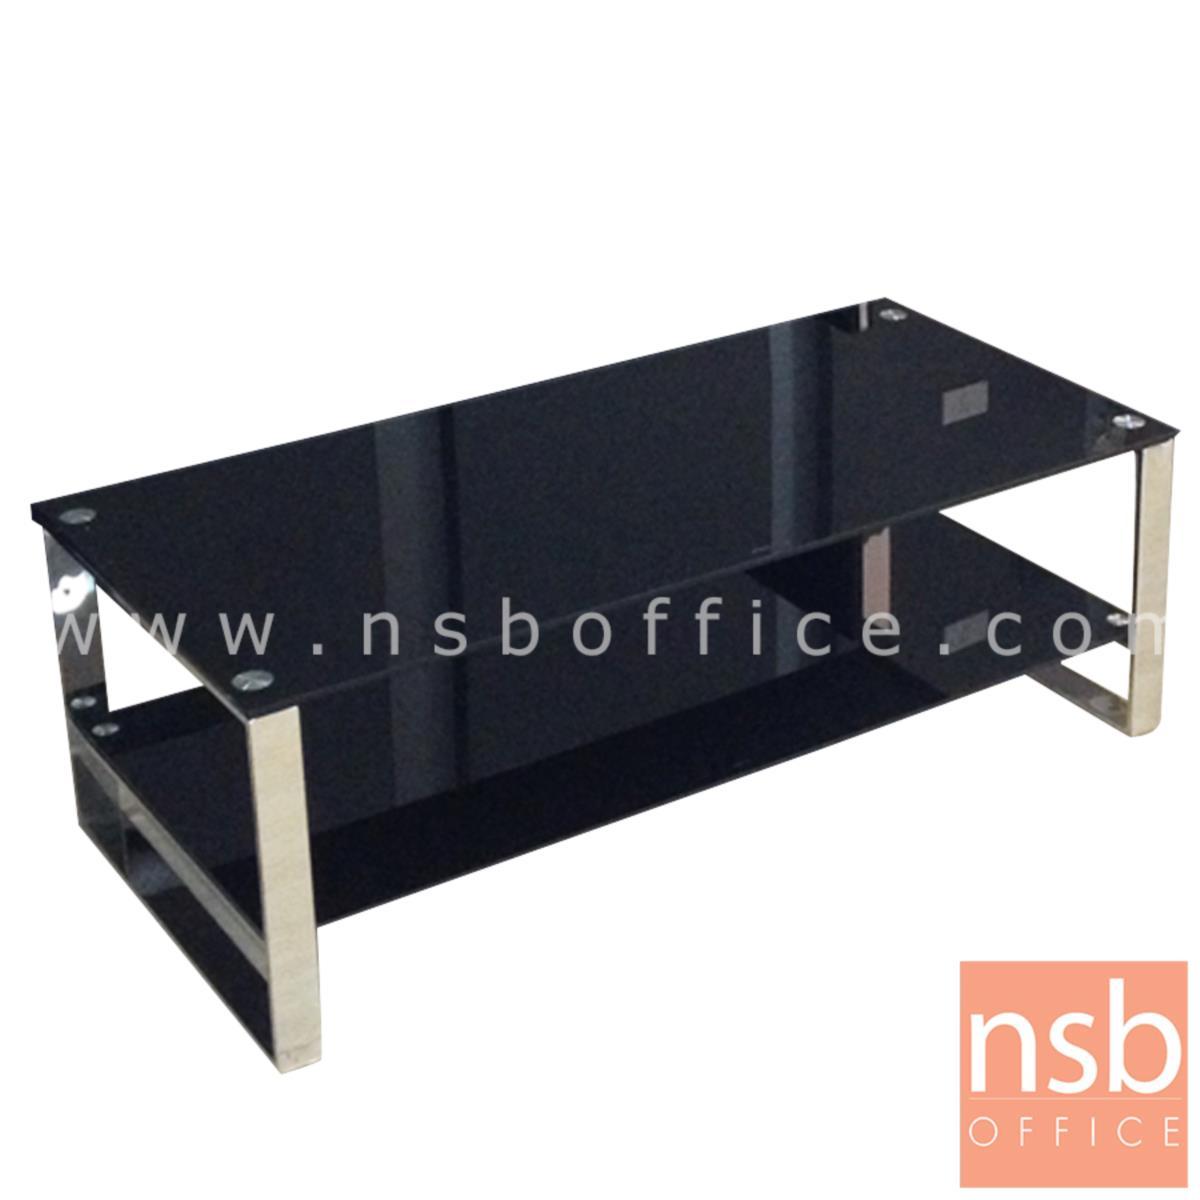 B13A151:โต๊ะกลางกระจกนิรภัยสีดำ  รุ่น Macbeth (แม็คเบ็ธ) ขนาด 120W cm. โครงขาสเตนเลส